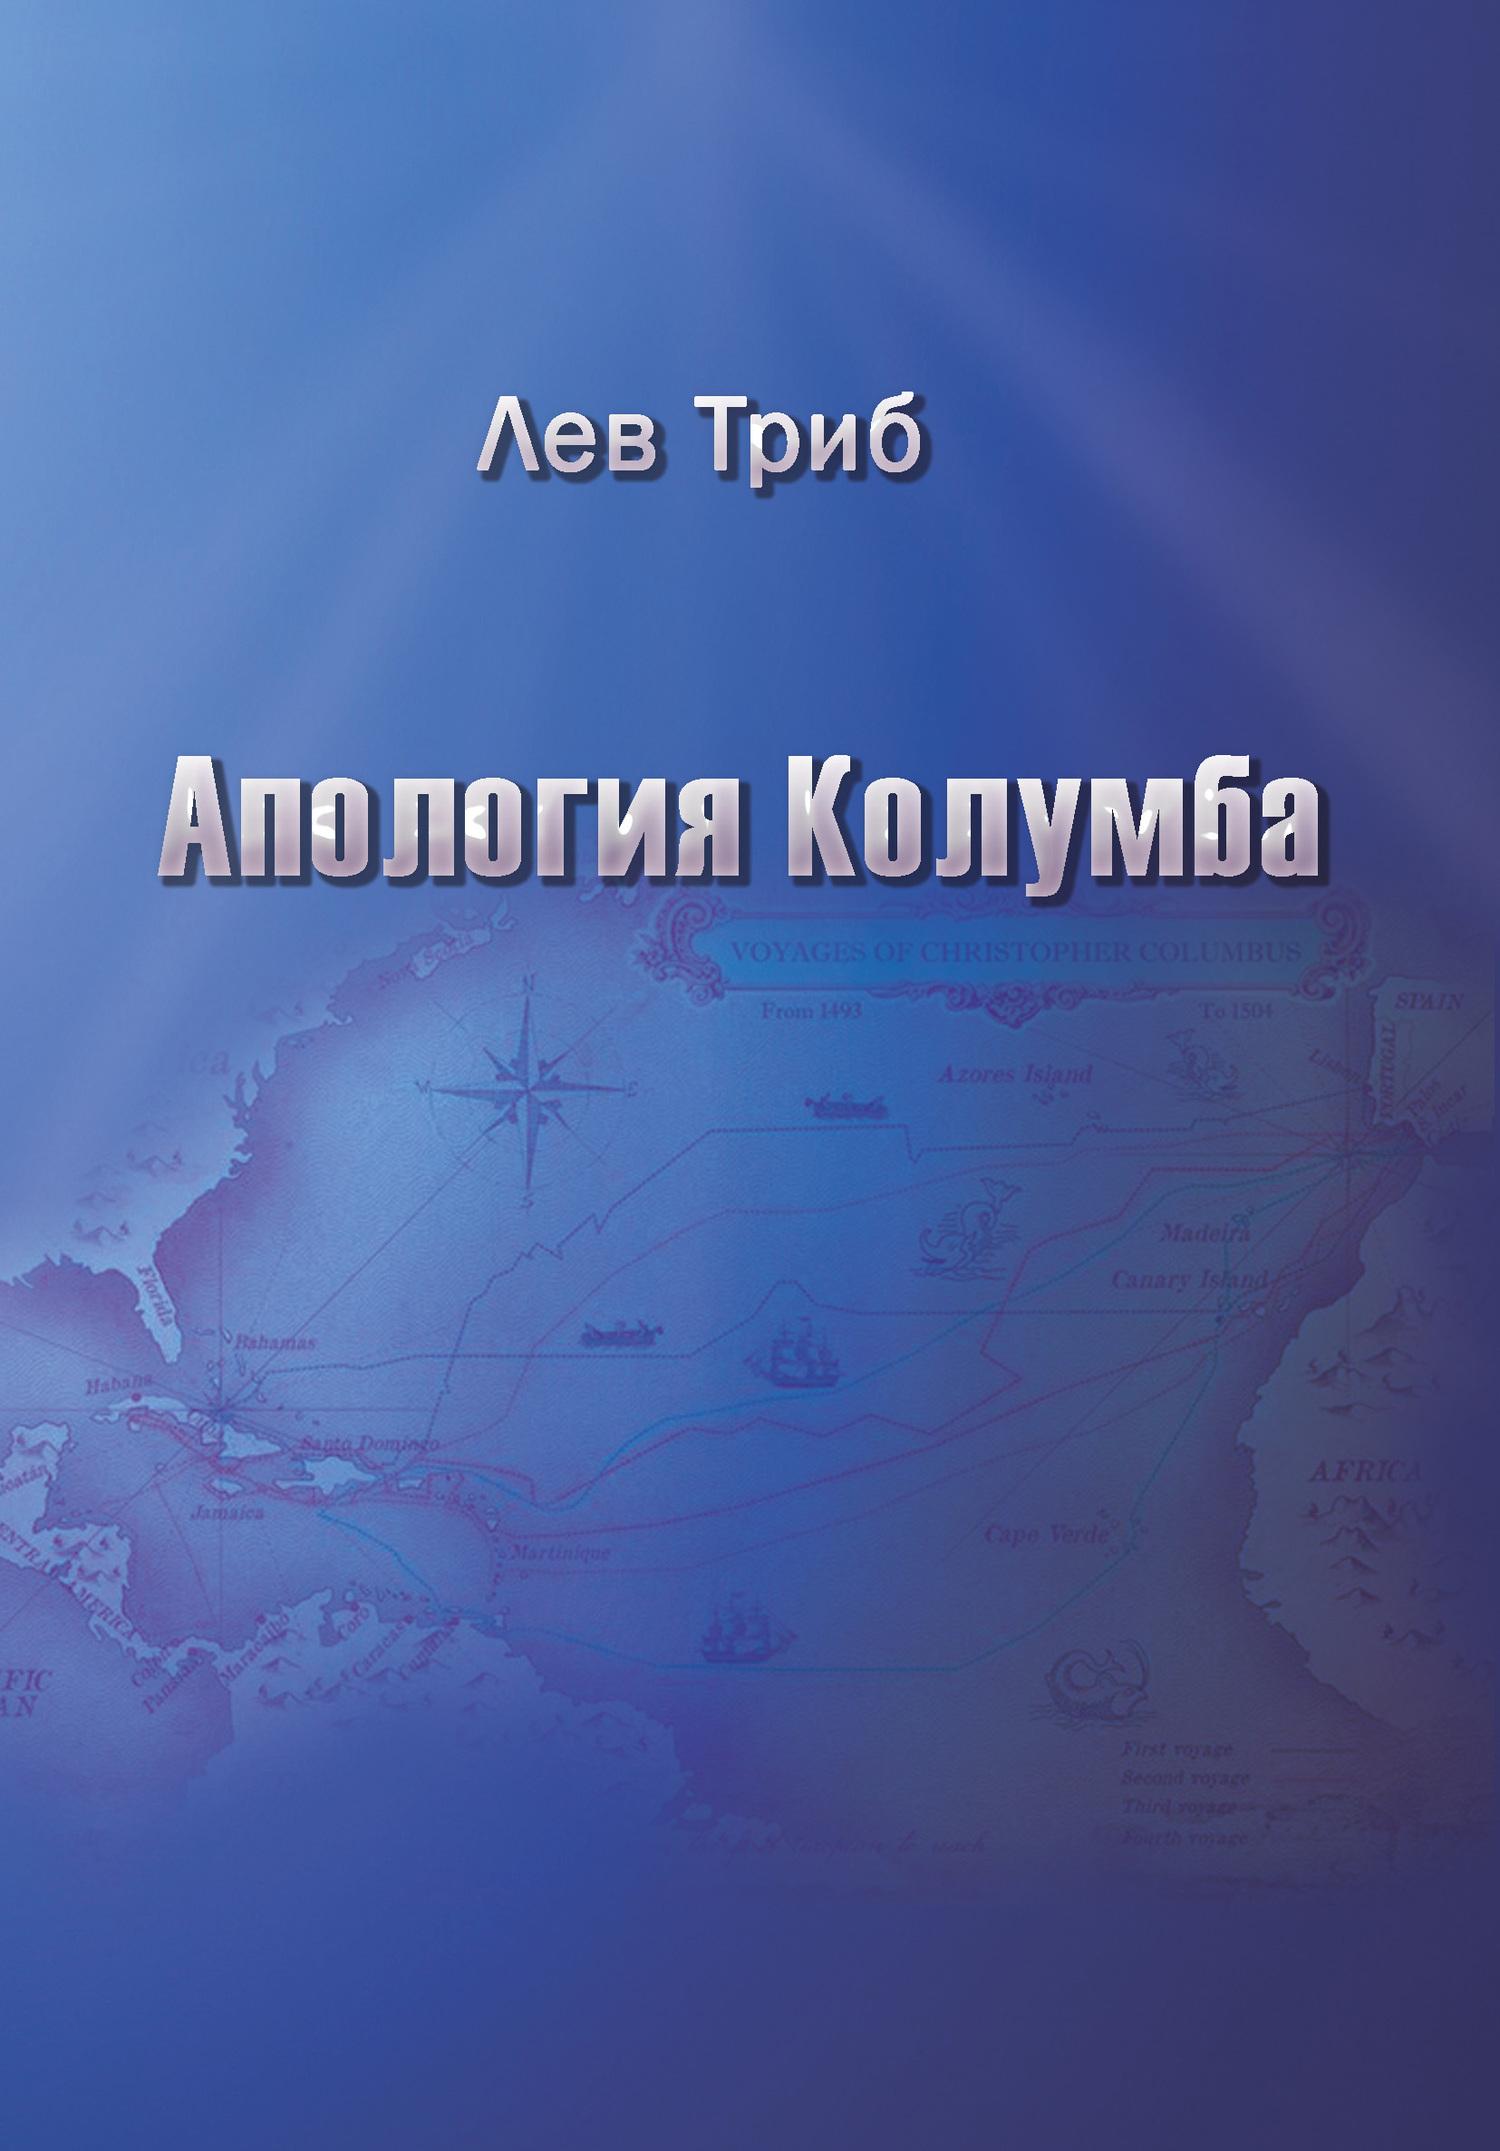 Лев Триб. Апология Колумба (сборник)